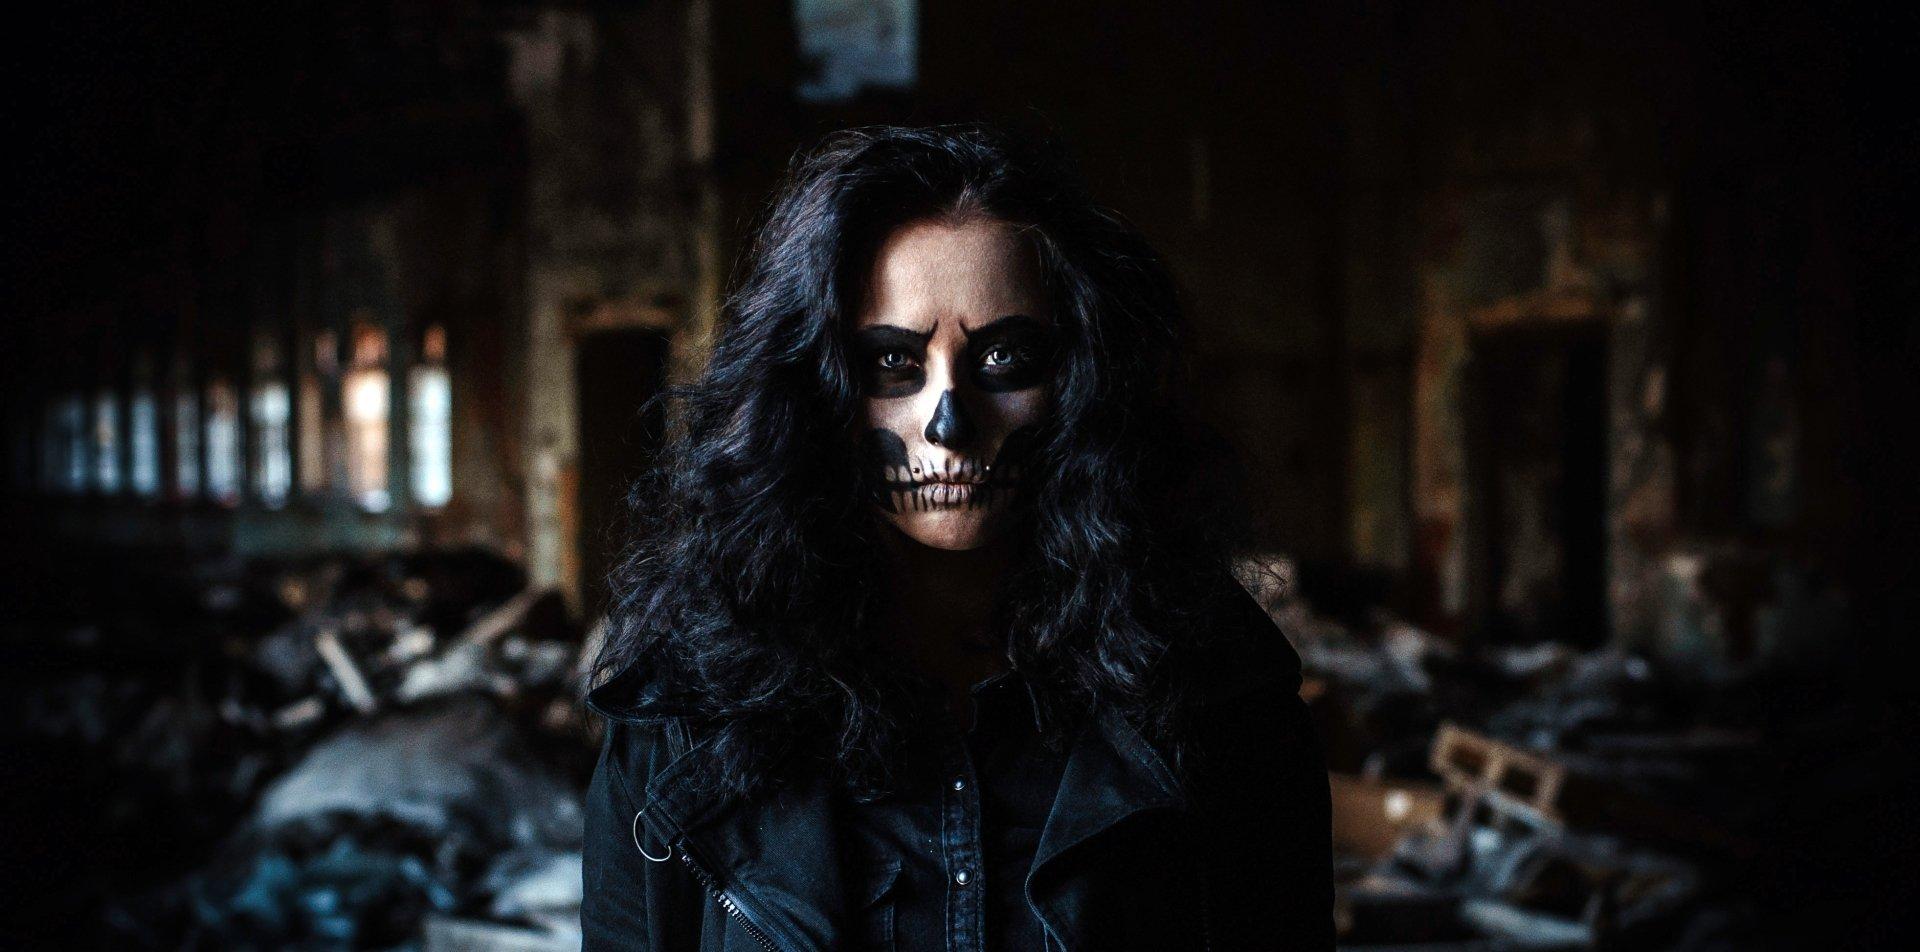 Artistic - Sugar Skull  Dark Woman Brunette Model Blue Eyes Wallpaper